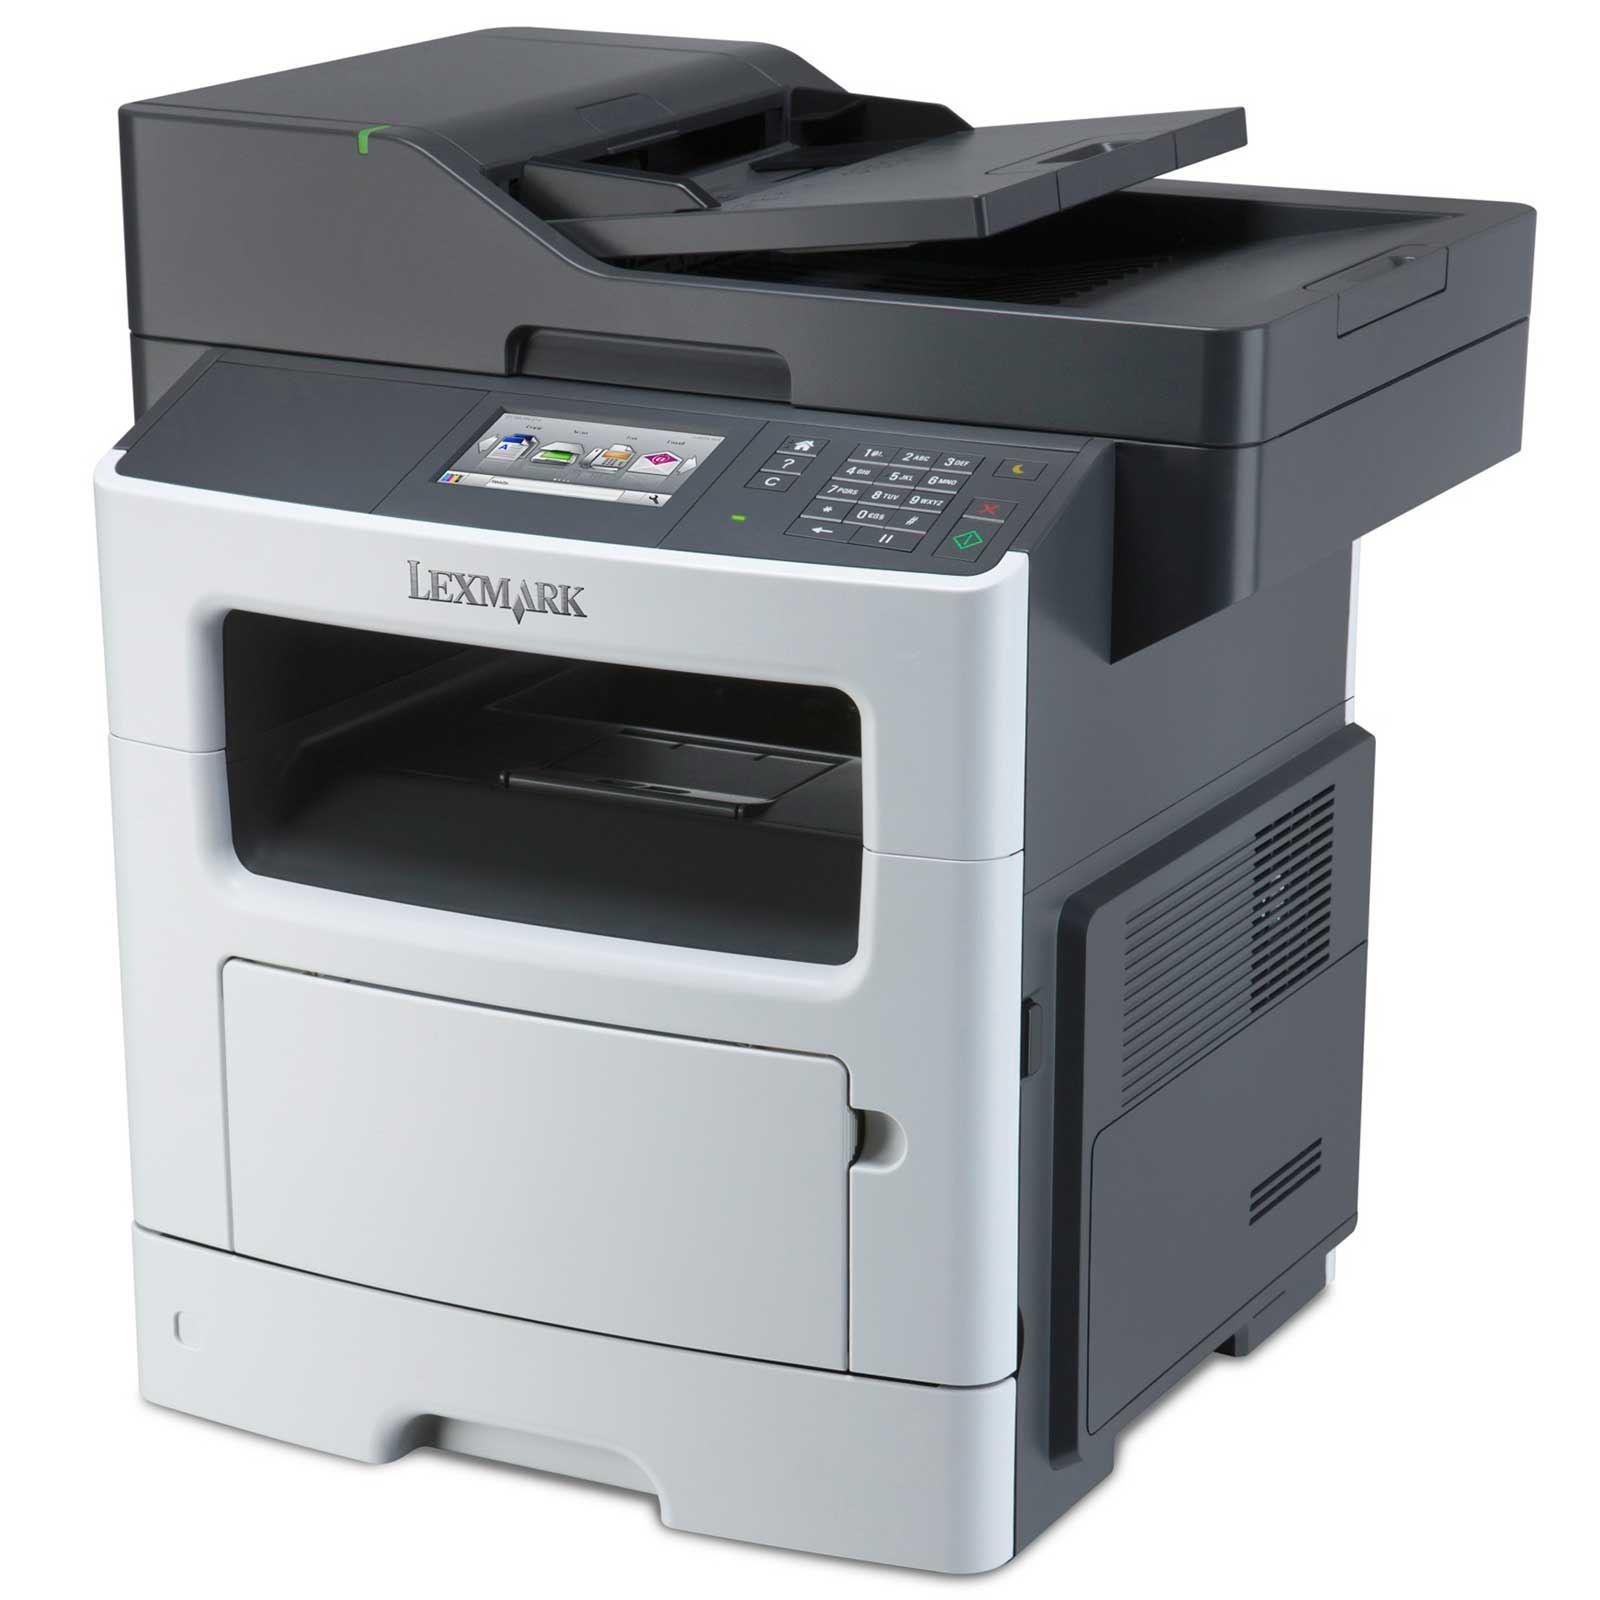 Lexmark MX510DE Multifunction Printer